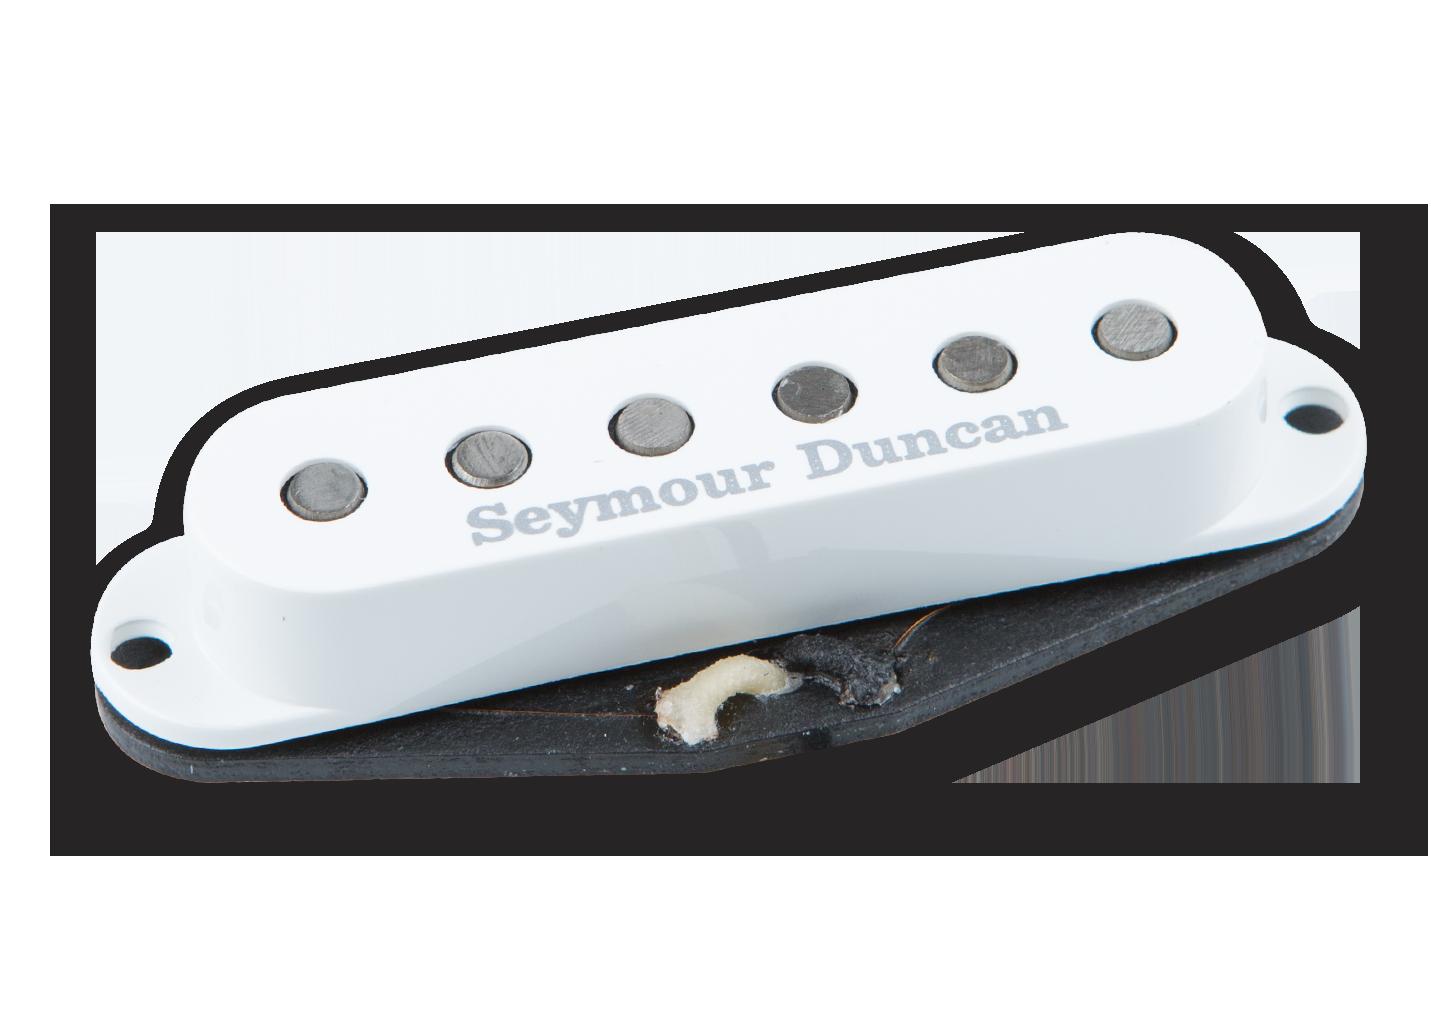 Seymour Duncan Alnico II Pro Flat Strat APS-2